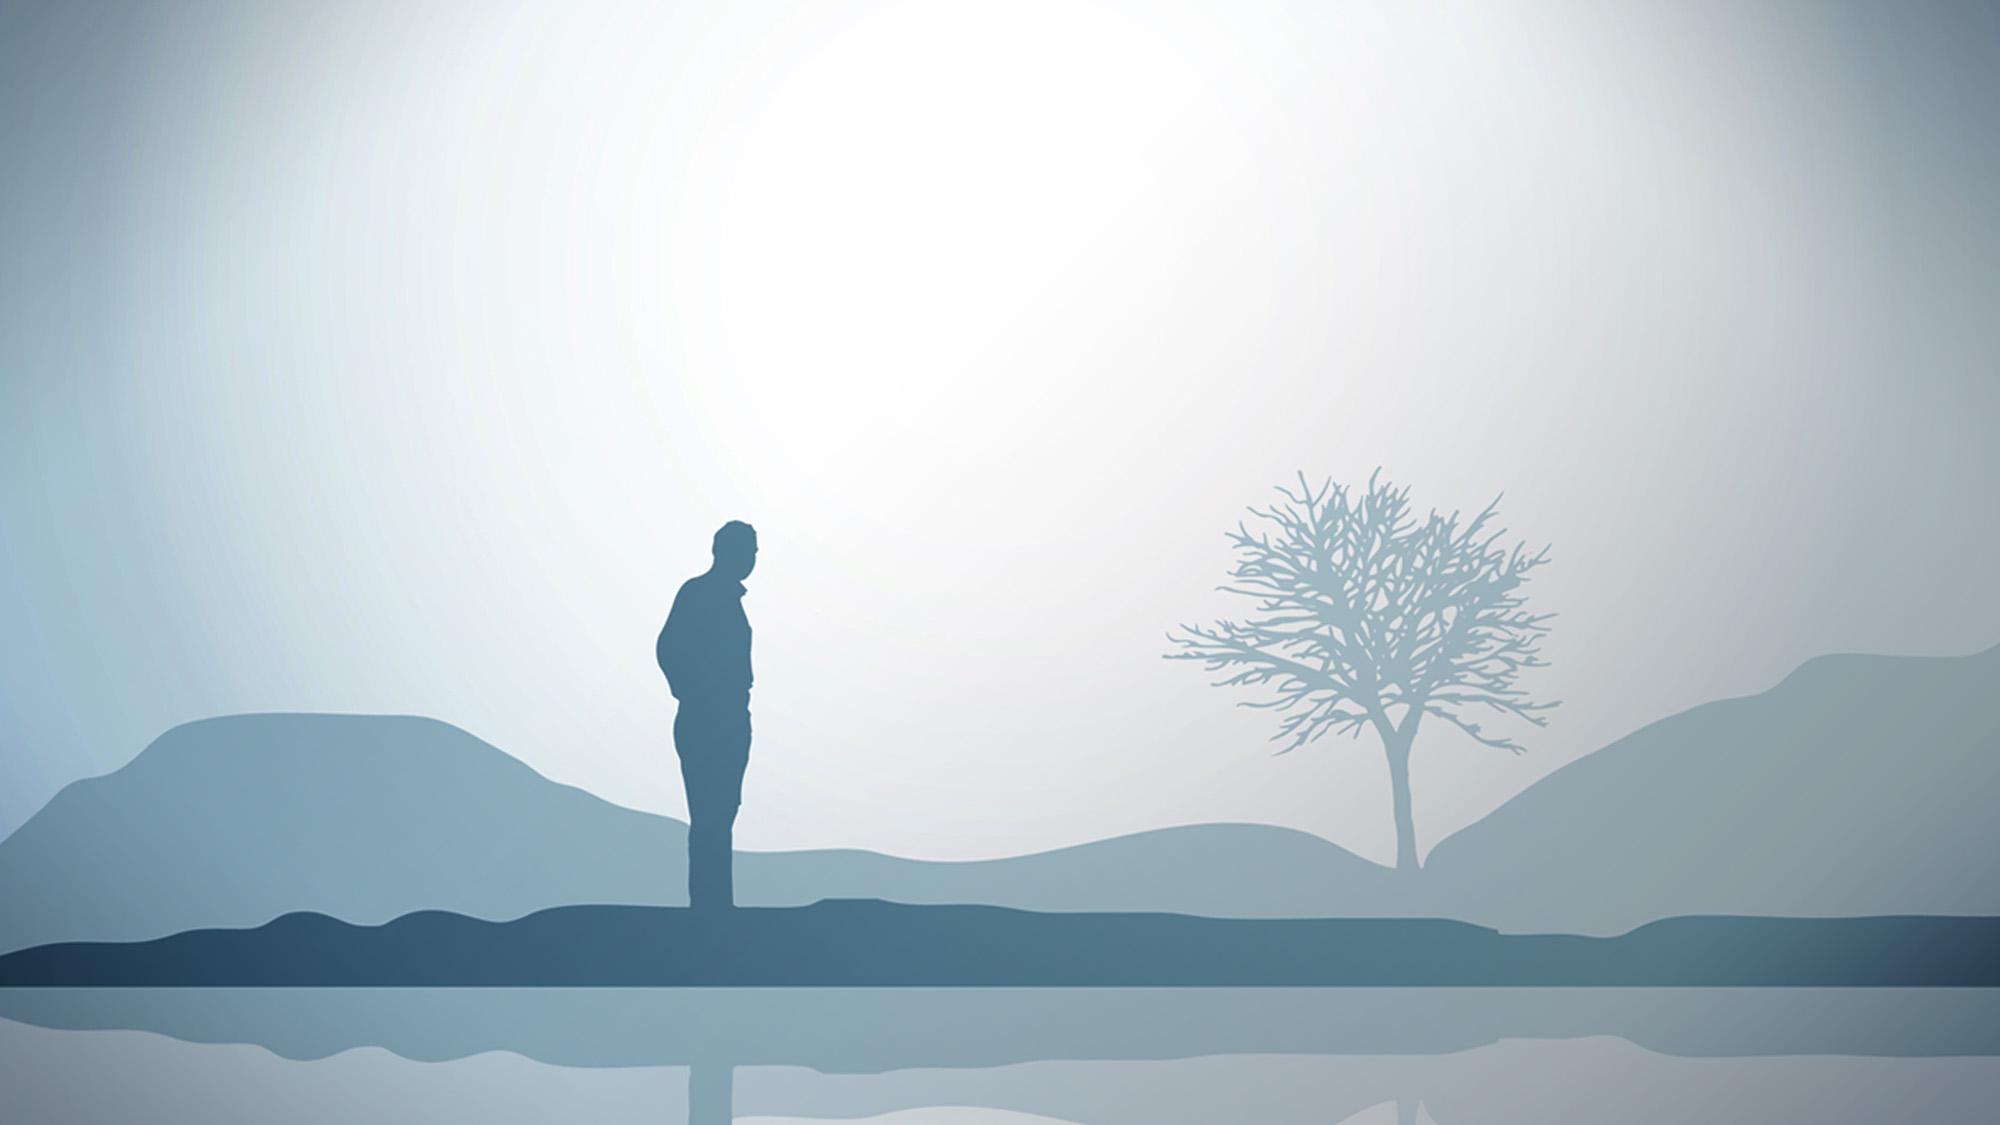 silence-solitude_wide_t_nt.jpg